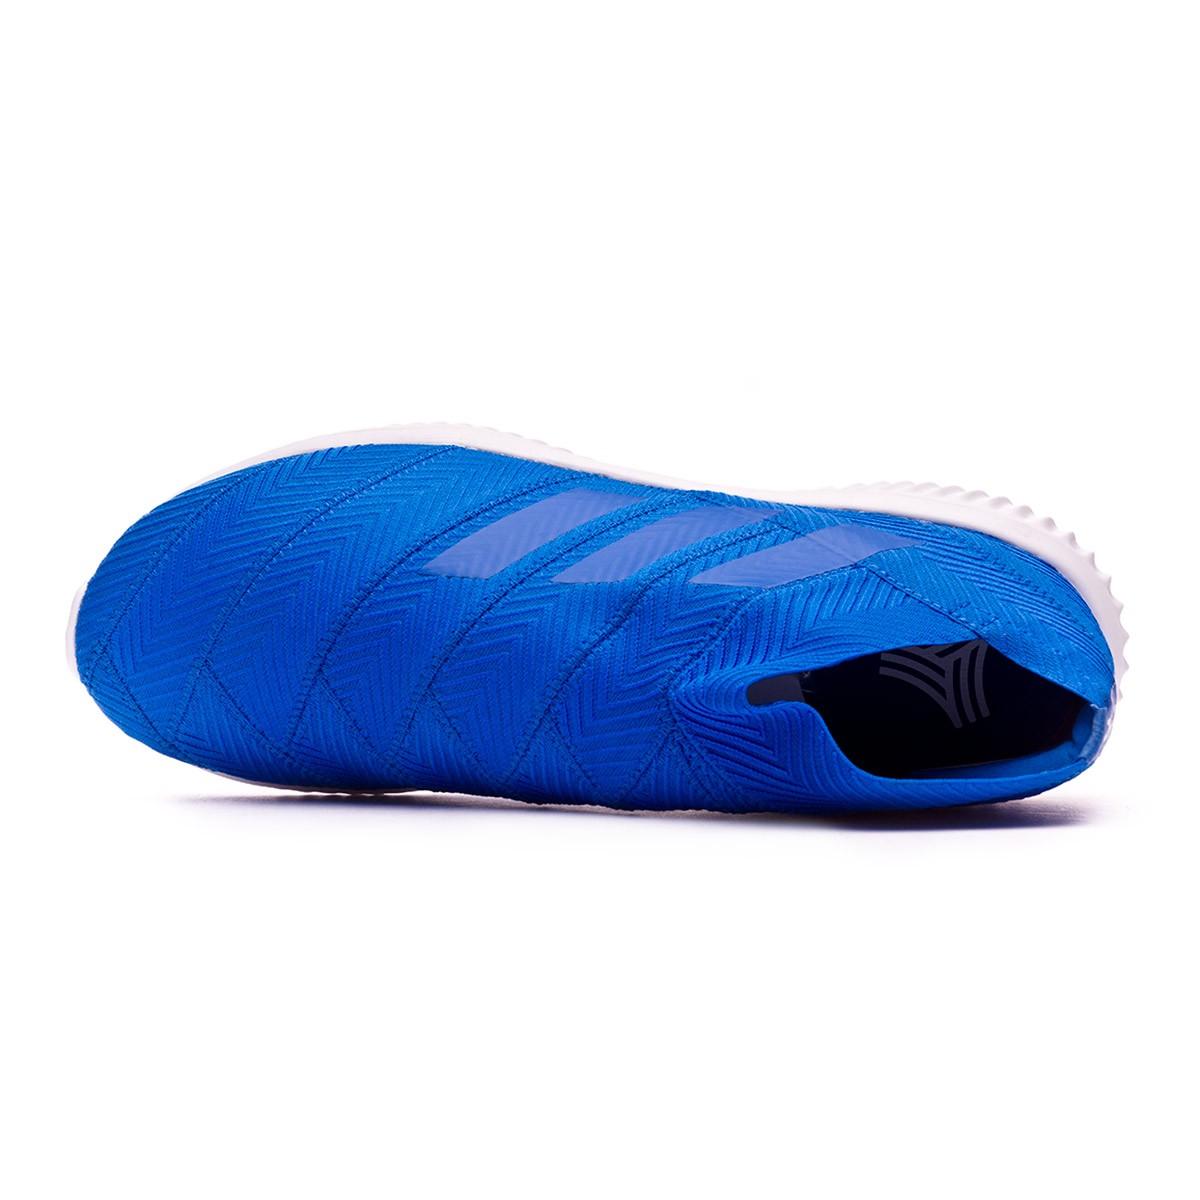 bee501a7a Trainers adidas Nemeziz Tango 18.1 TR Football blue-White - Football store  Fútbol Emotion